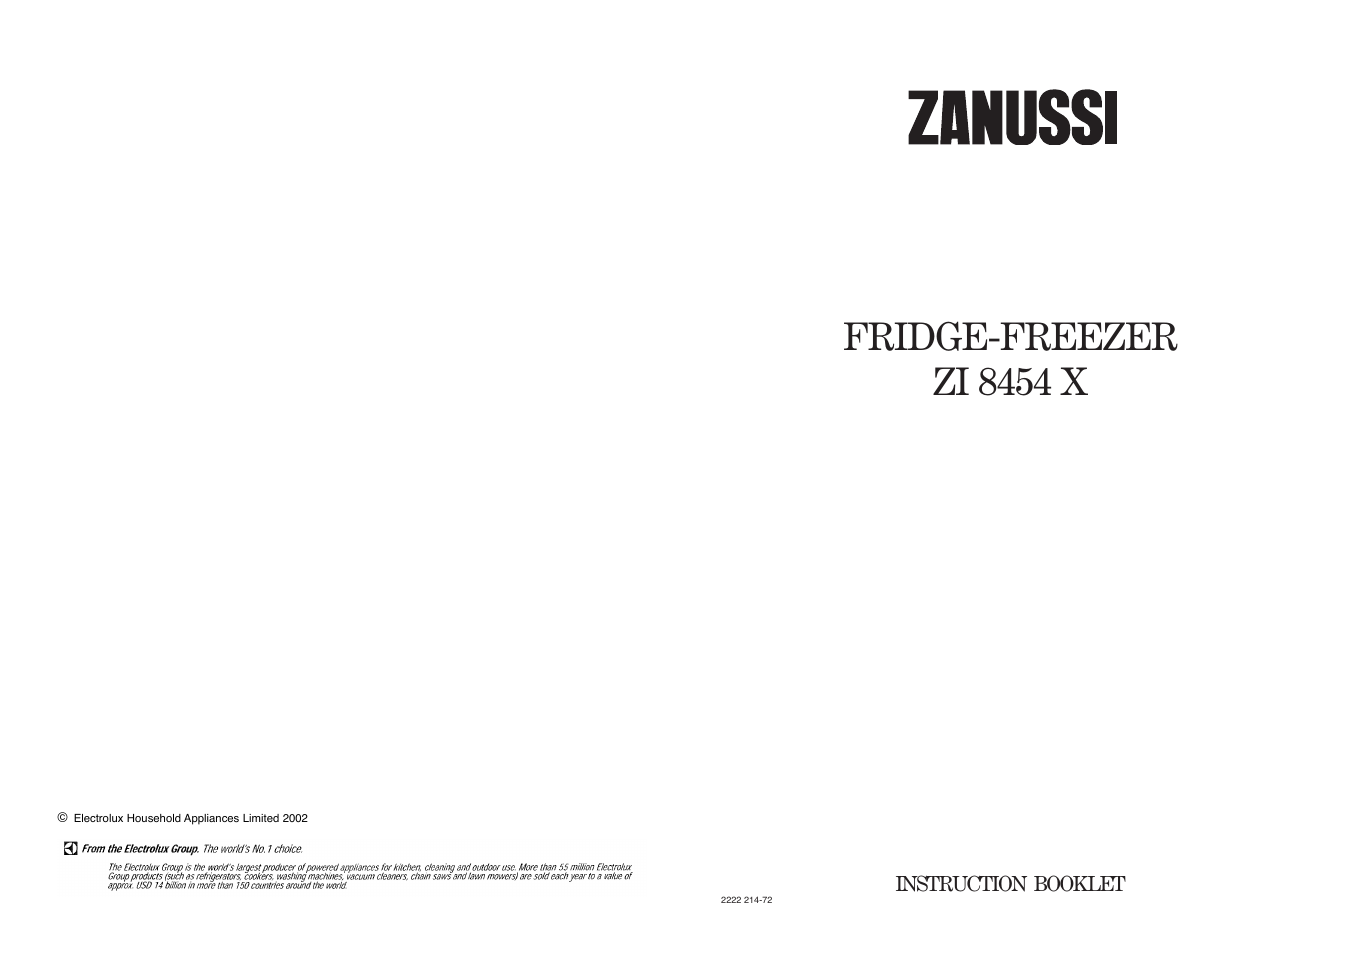 Fridge-freezer zi 8454 x   Zanussi ZI 8454 X User Manual   Page 20